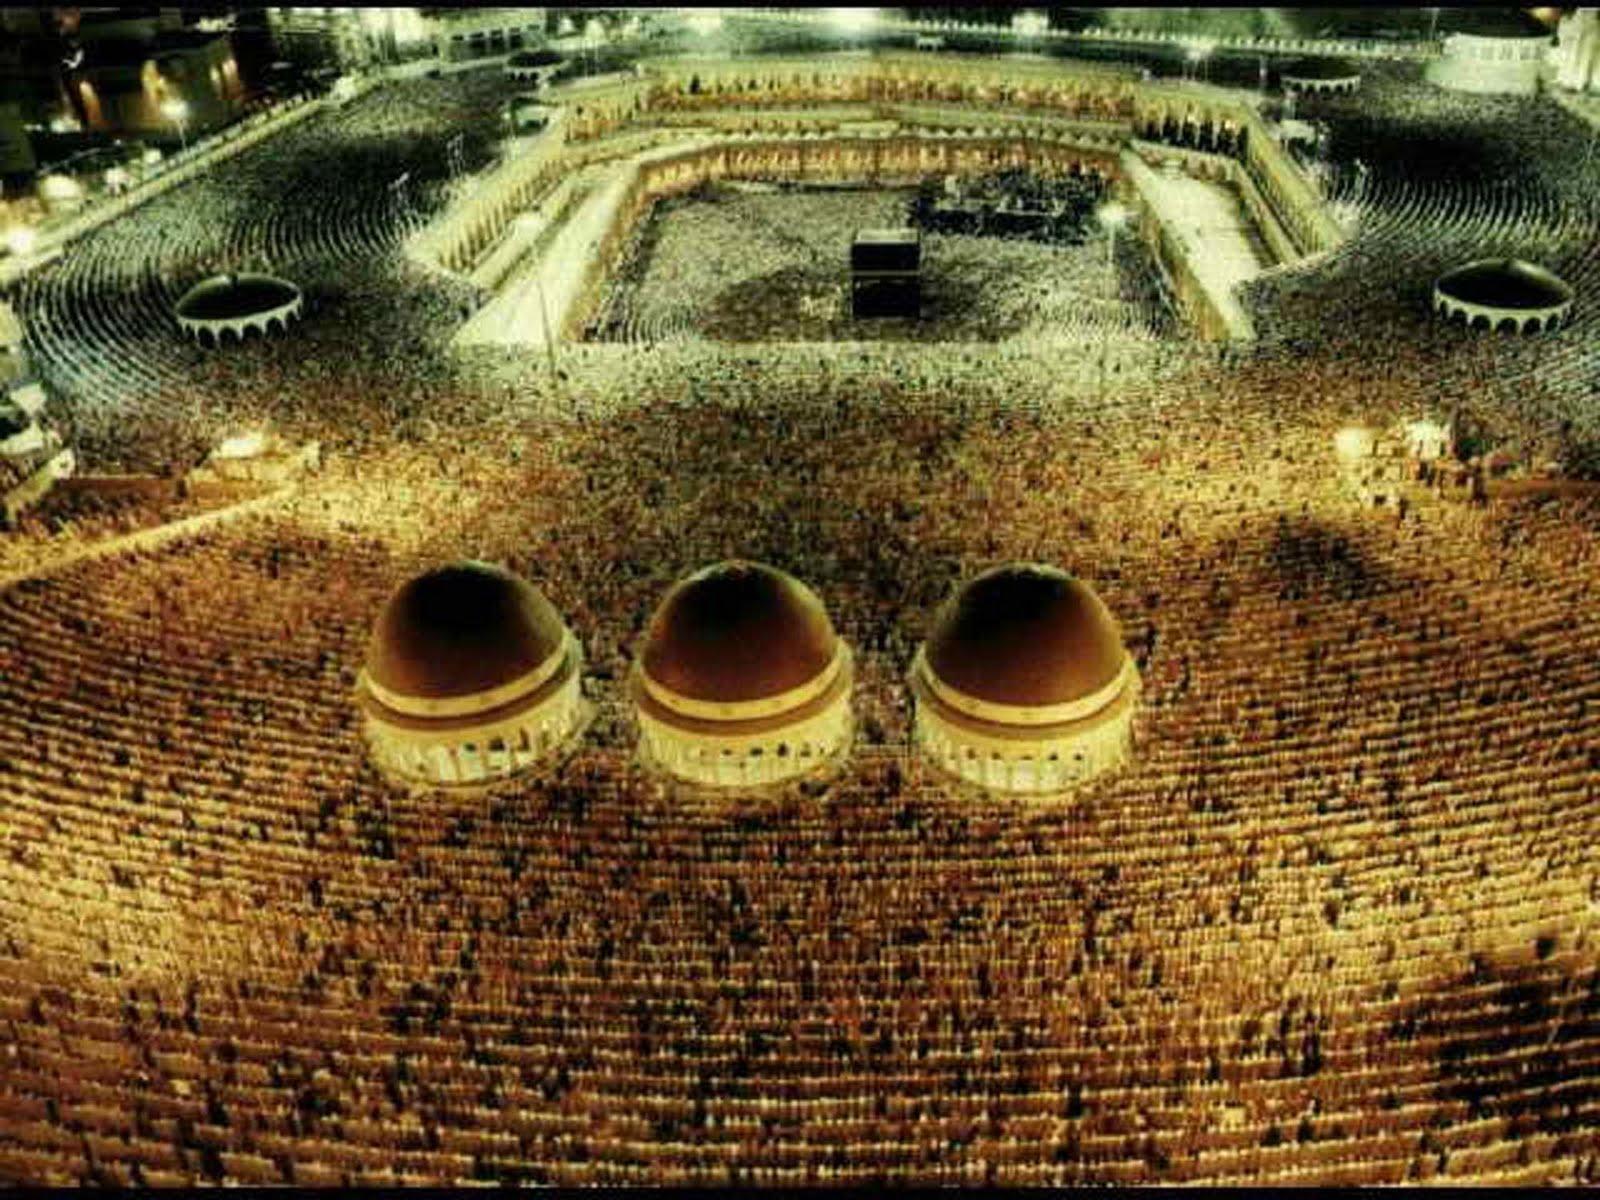 http://4.bp.blogspot.com/-ogHA7TVwOnA/Tbkrz2i1ogI/AAAAAAAAACk/VP2rpGm5n7M/s1600/kaaba-kabba-mecca-8.jpg